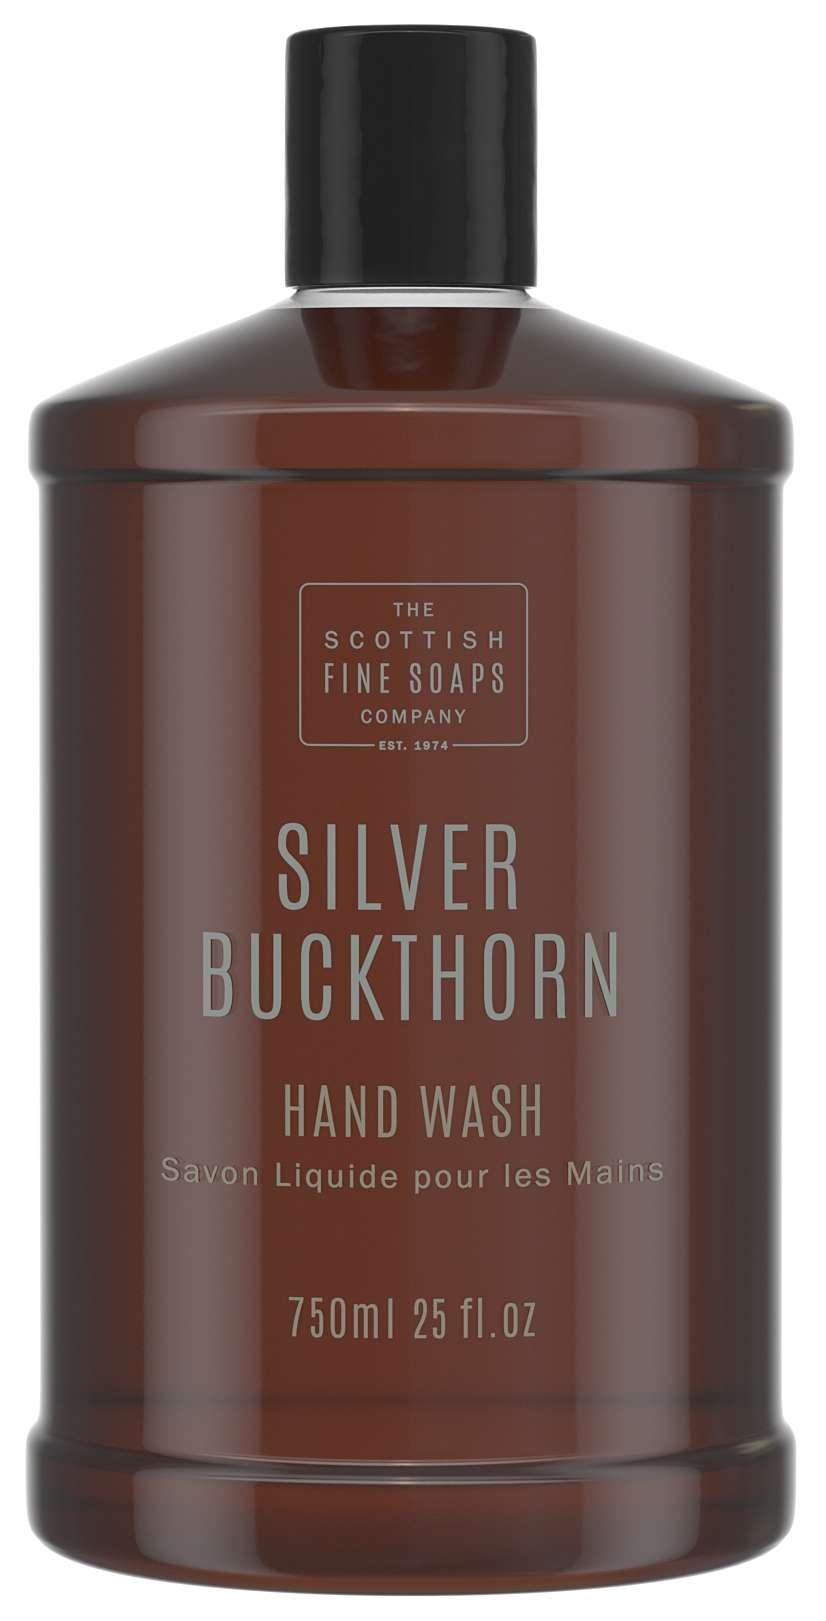 Silver Buckthorn Hand Wash Refill